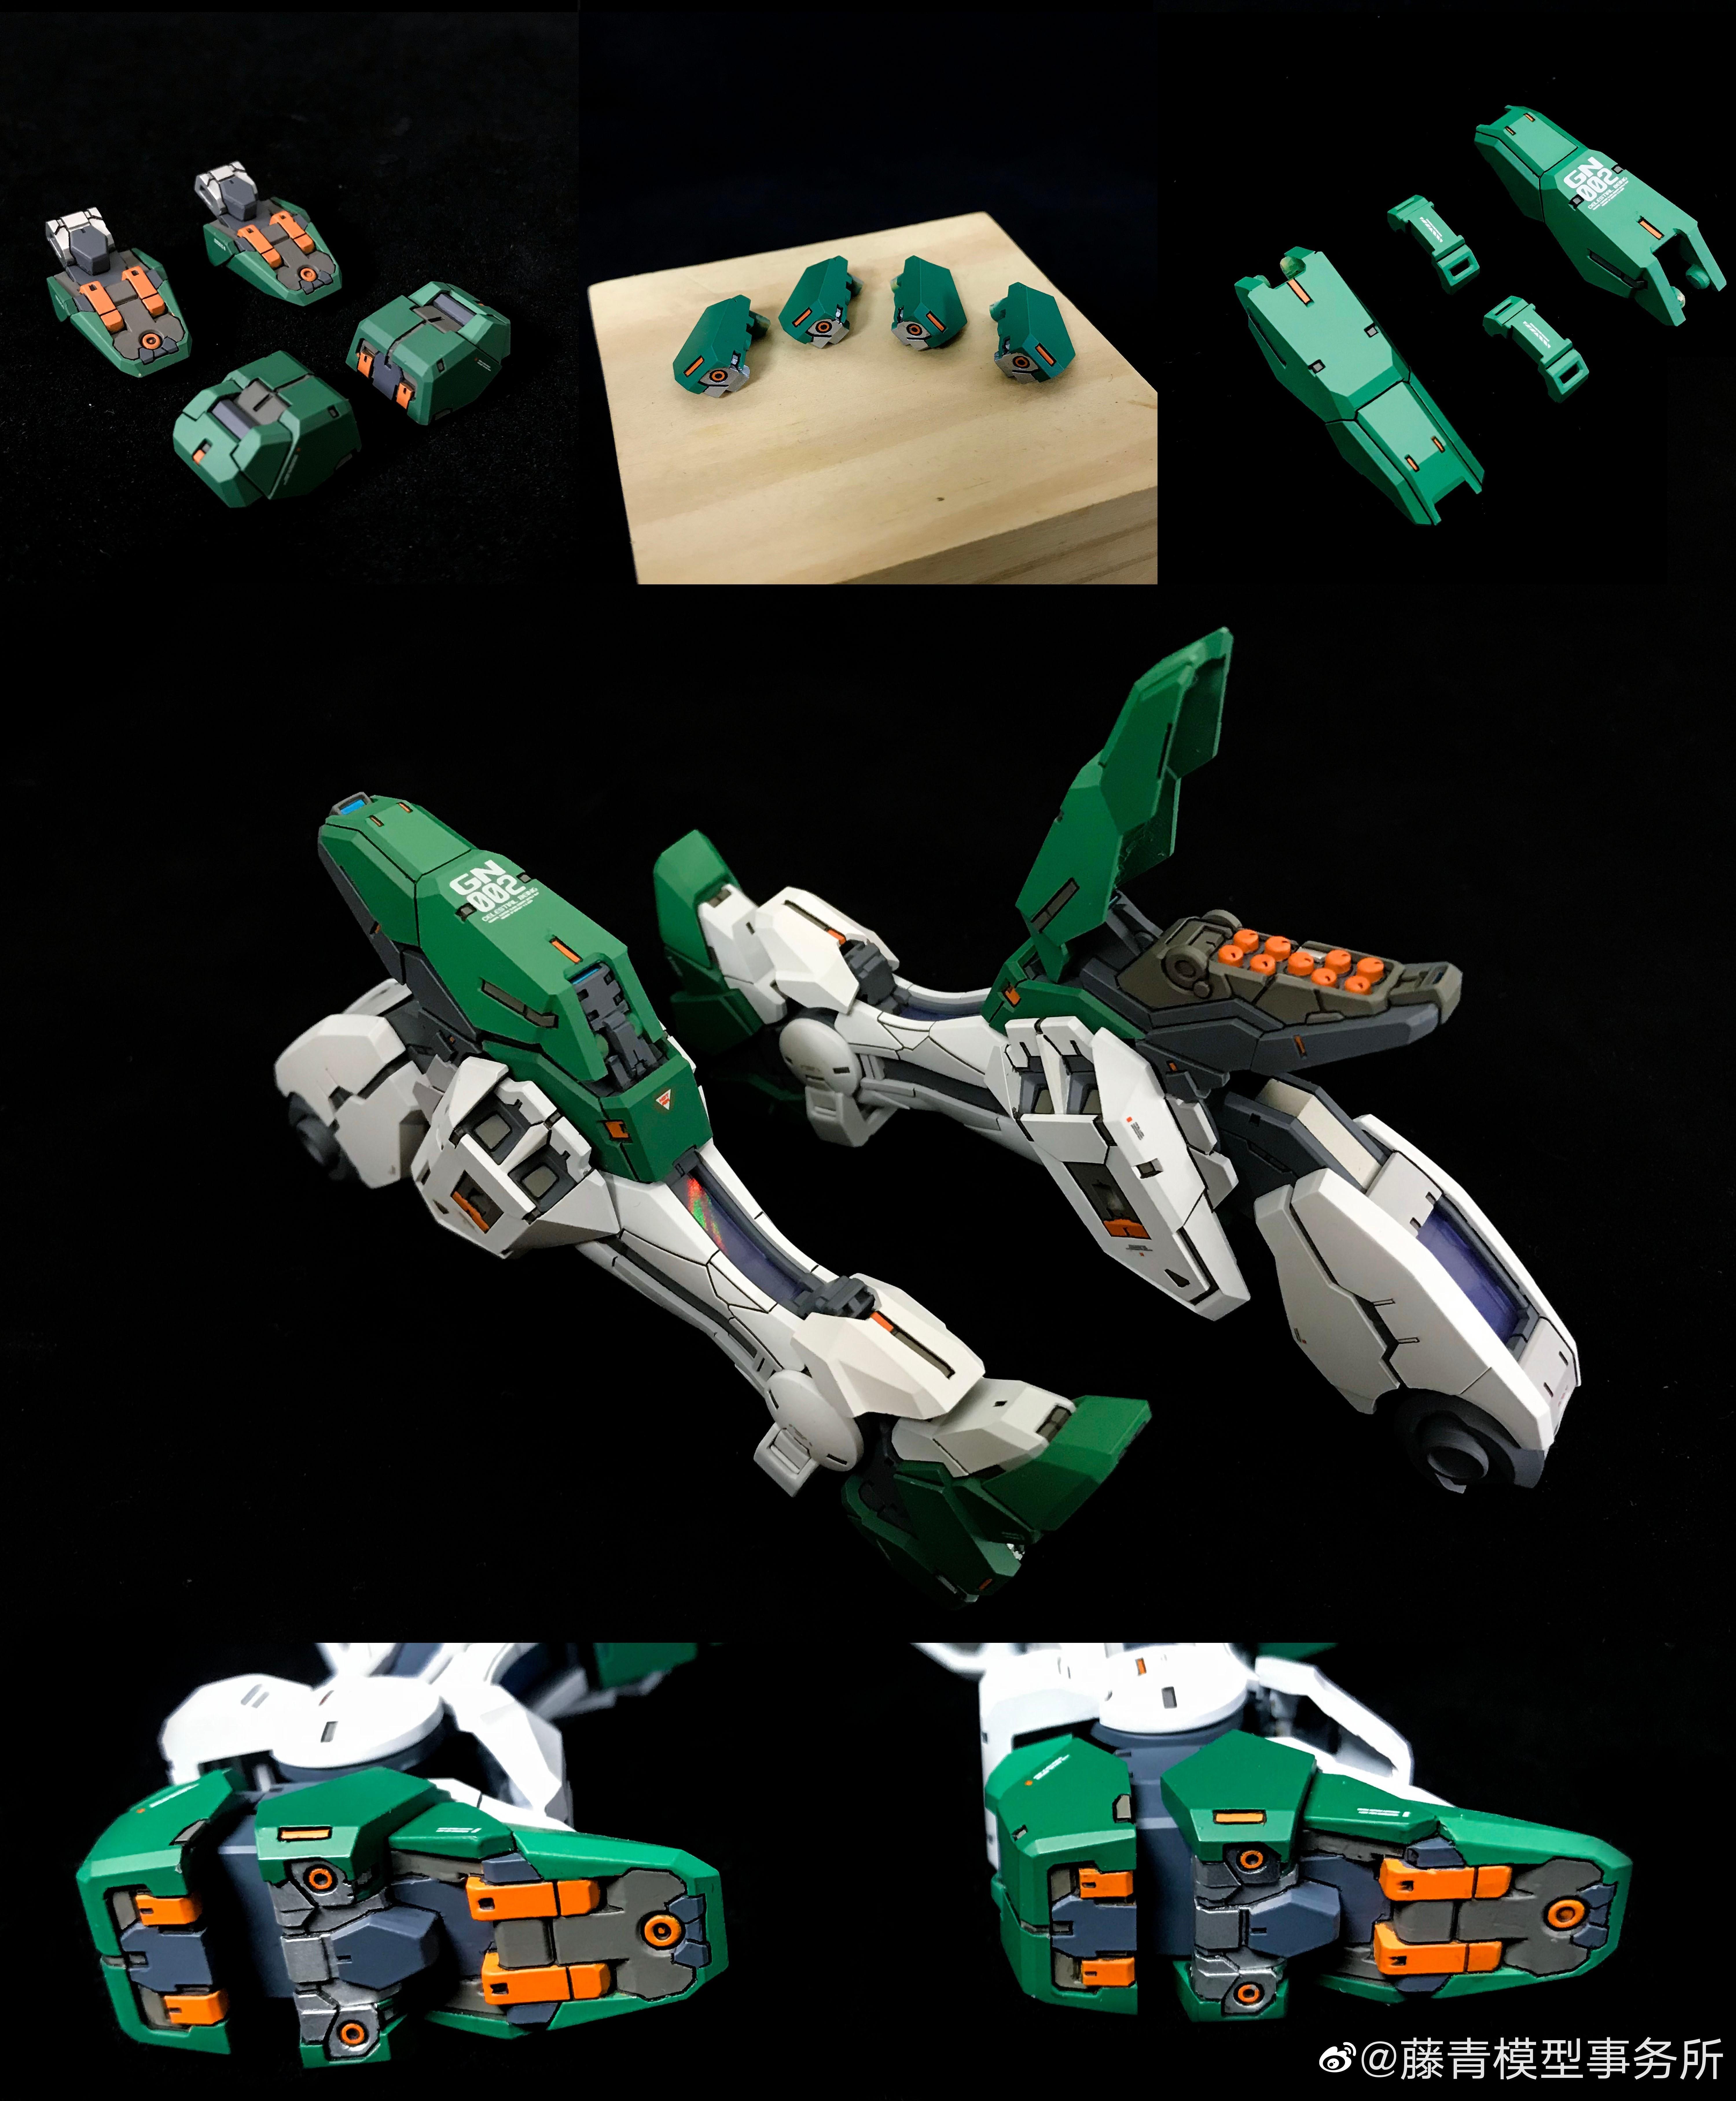 G507_Fortune_Meows_Studio_GN002_Gundam_Dynames_MG_004_2.jpg